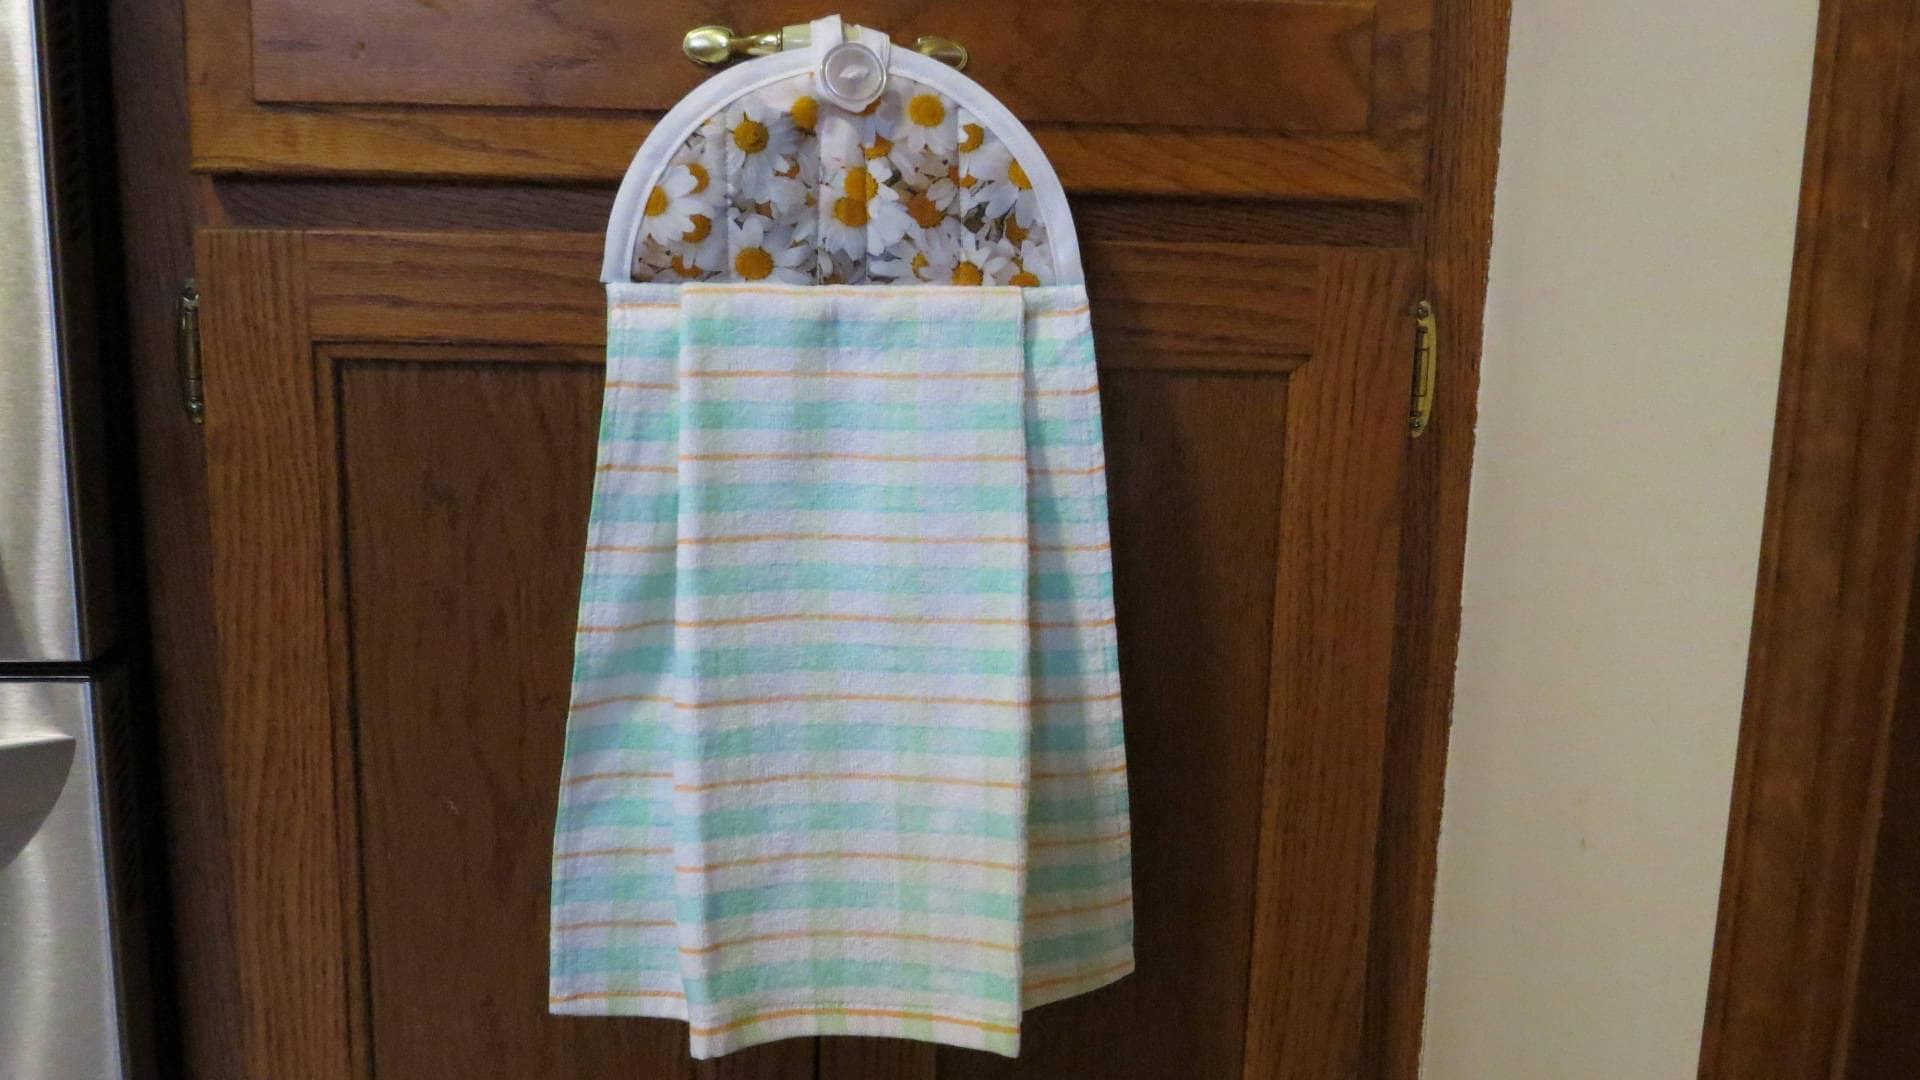 Kitchen Towel Daisy Dish Towel Hanging Kitchen Towel Hanging